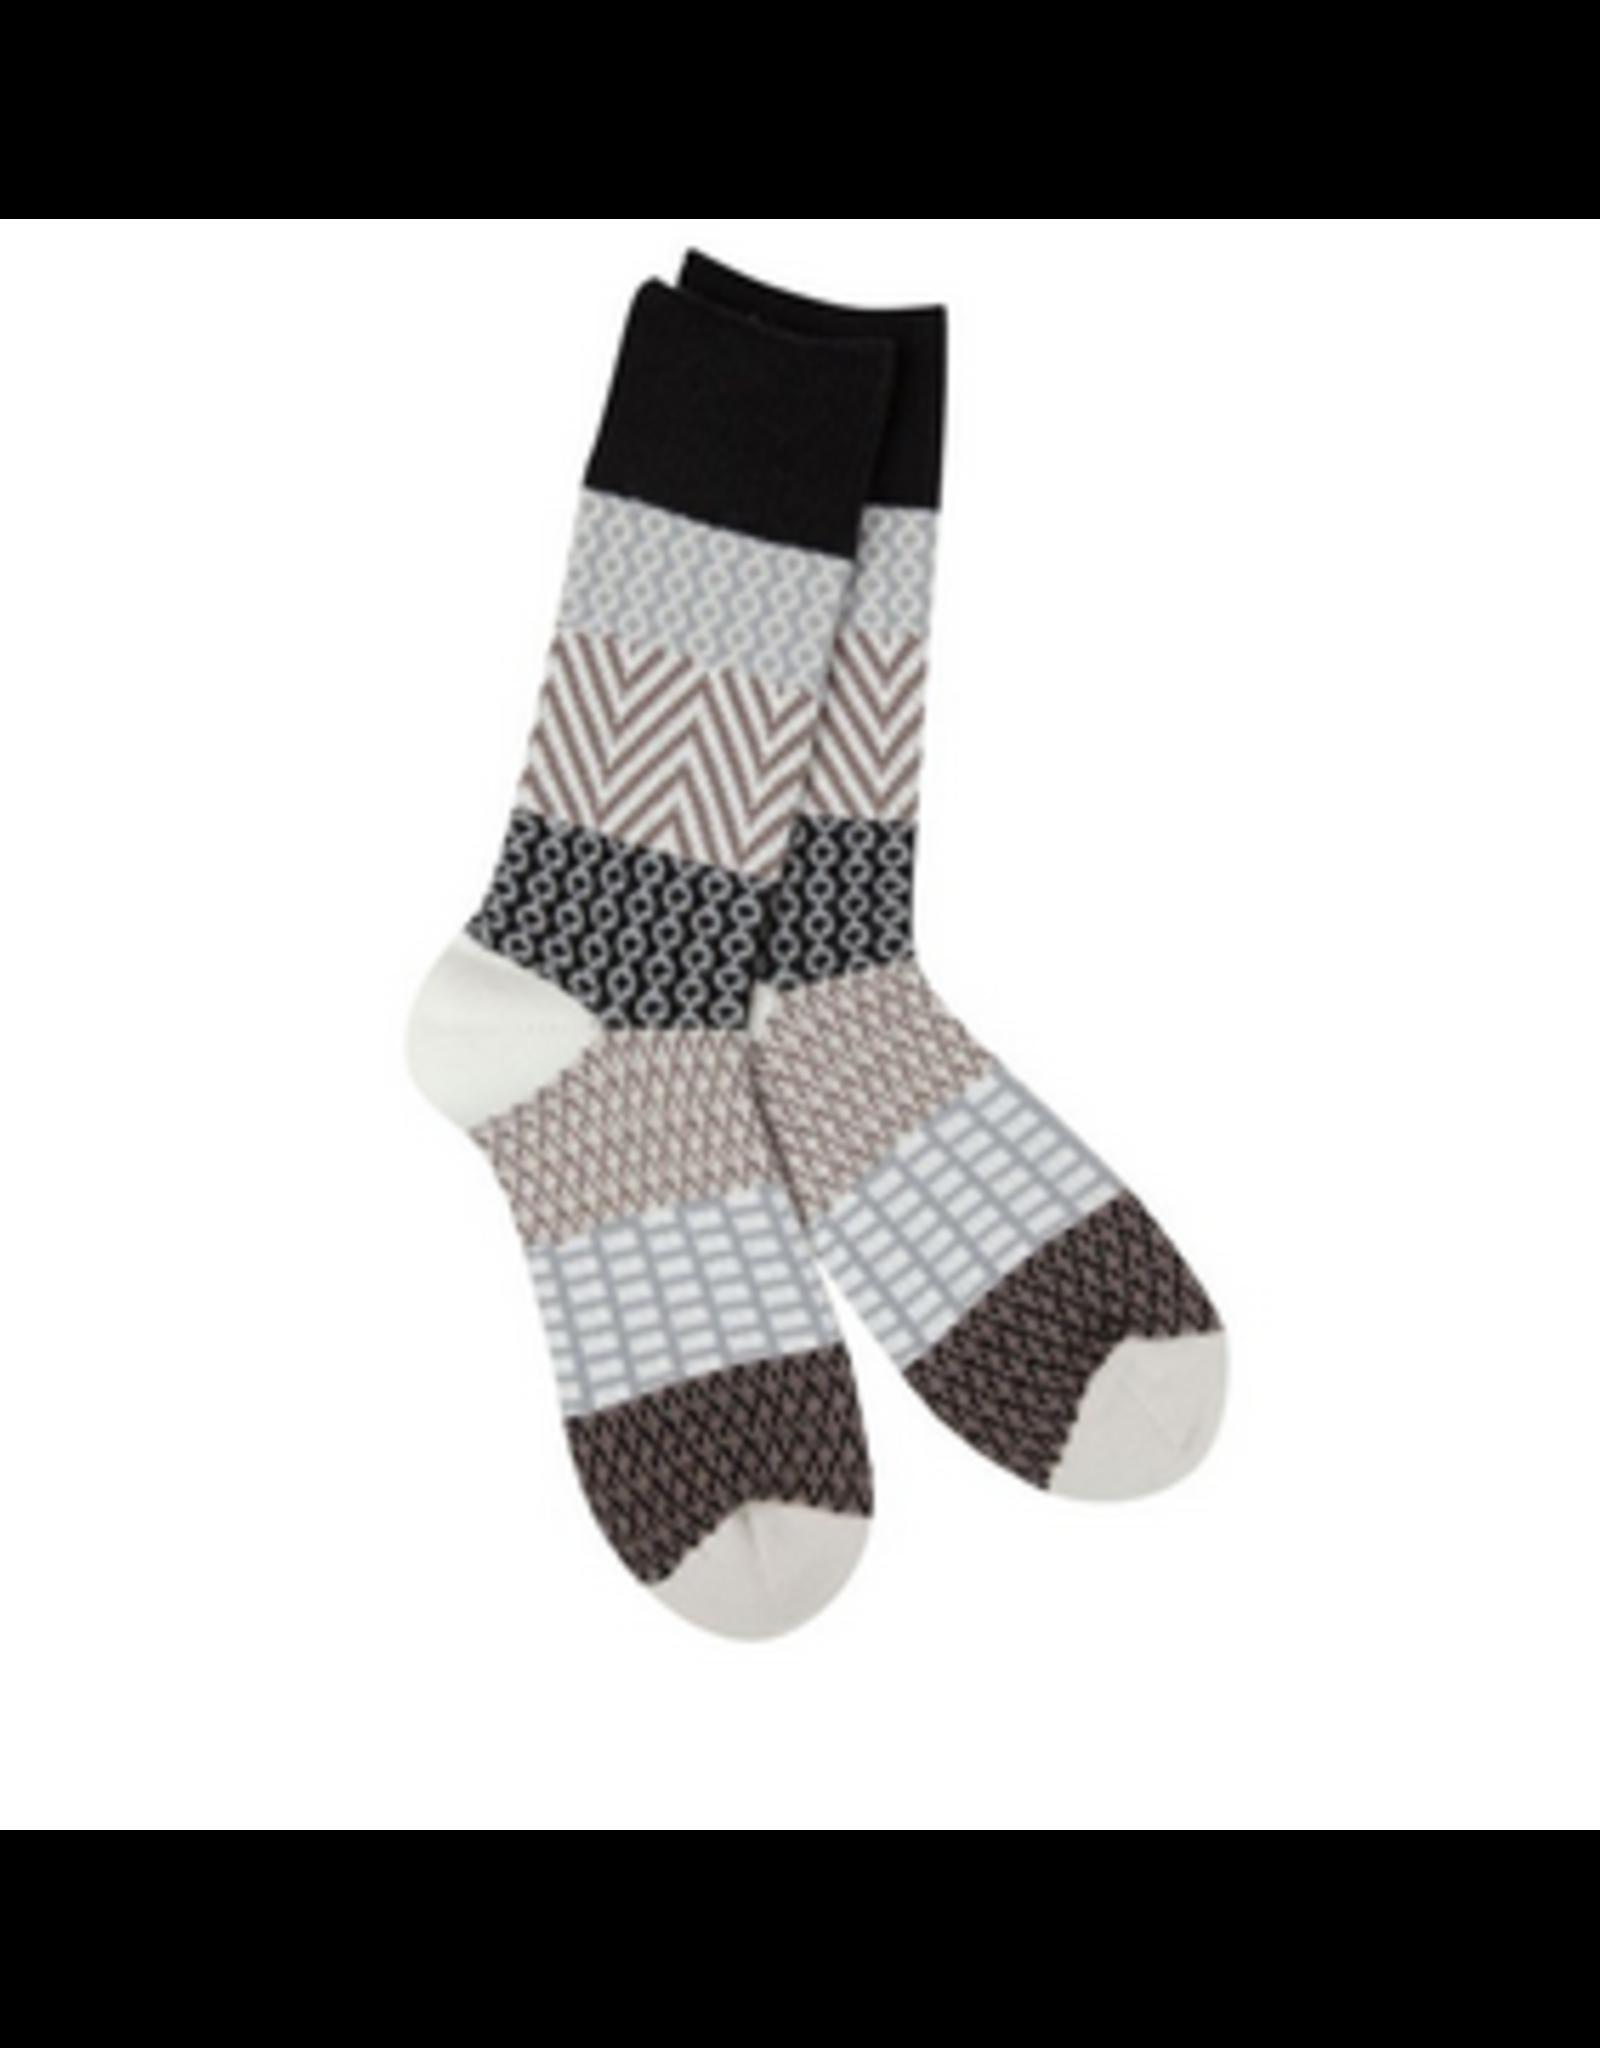 Gallery Crew Socks